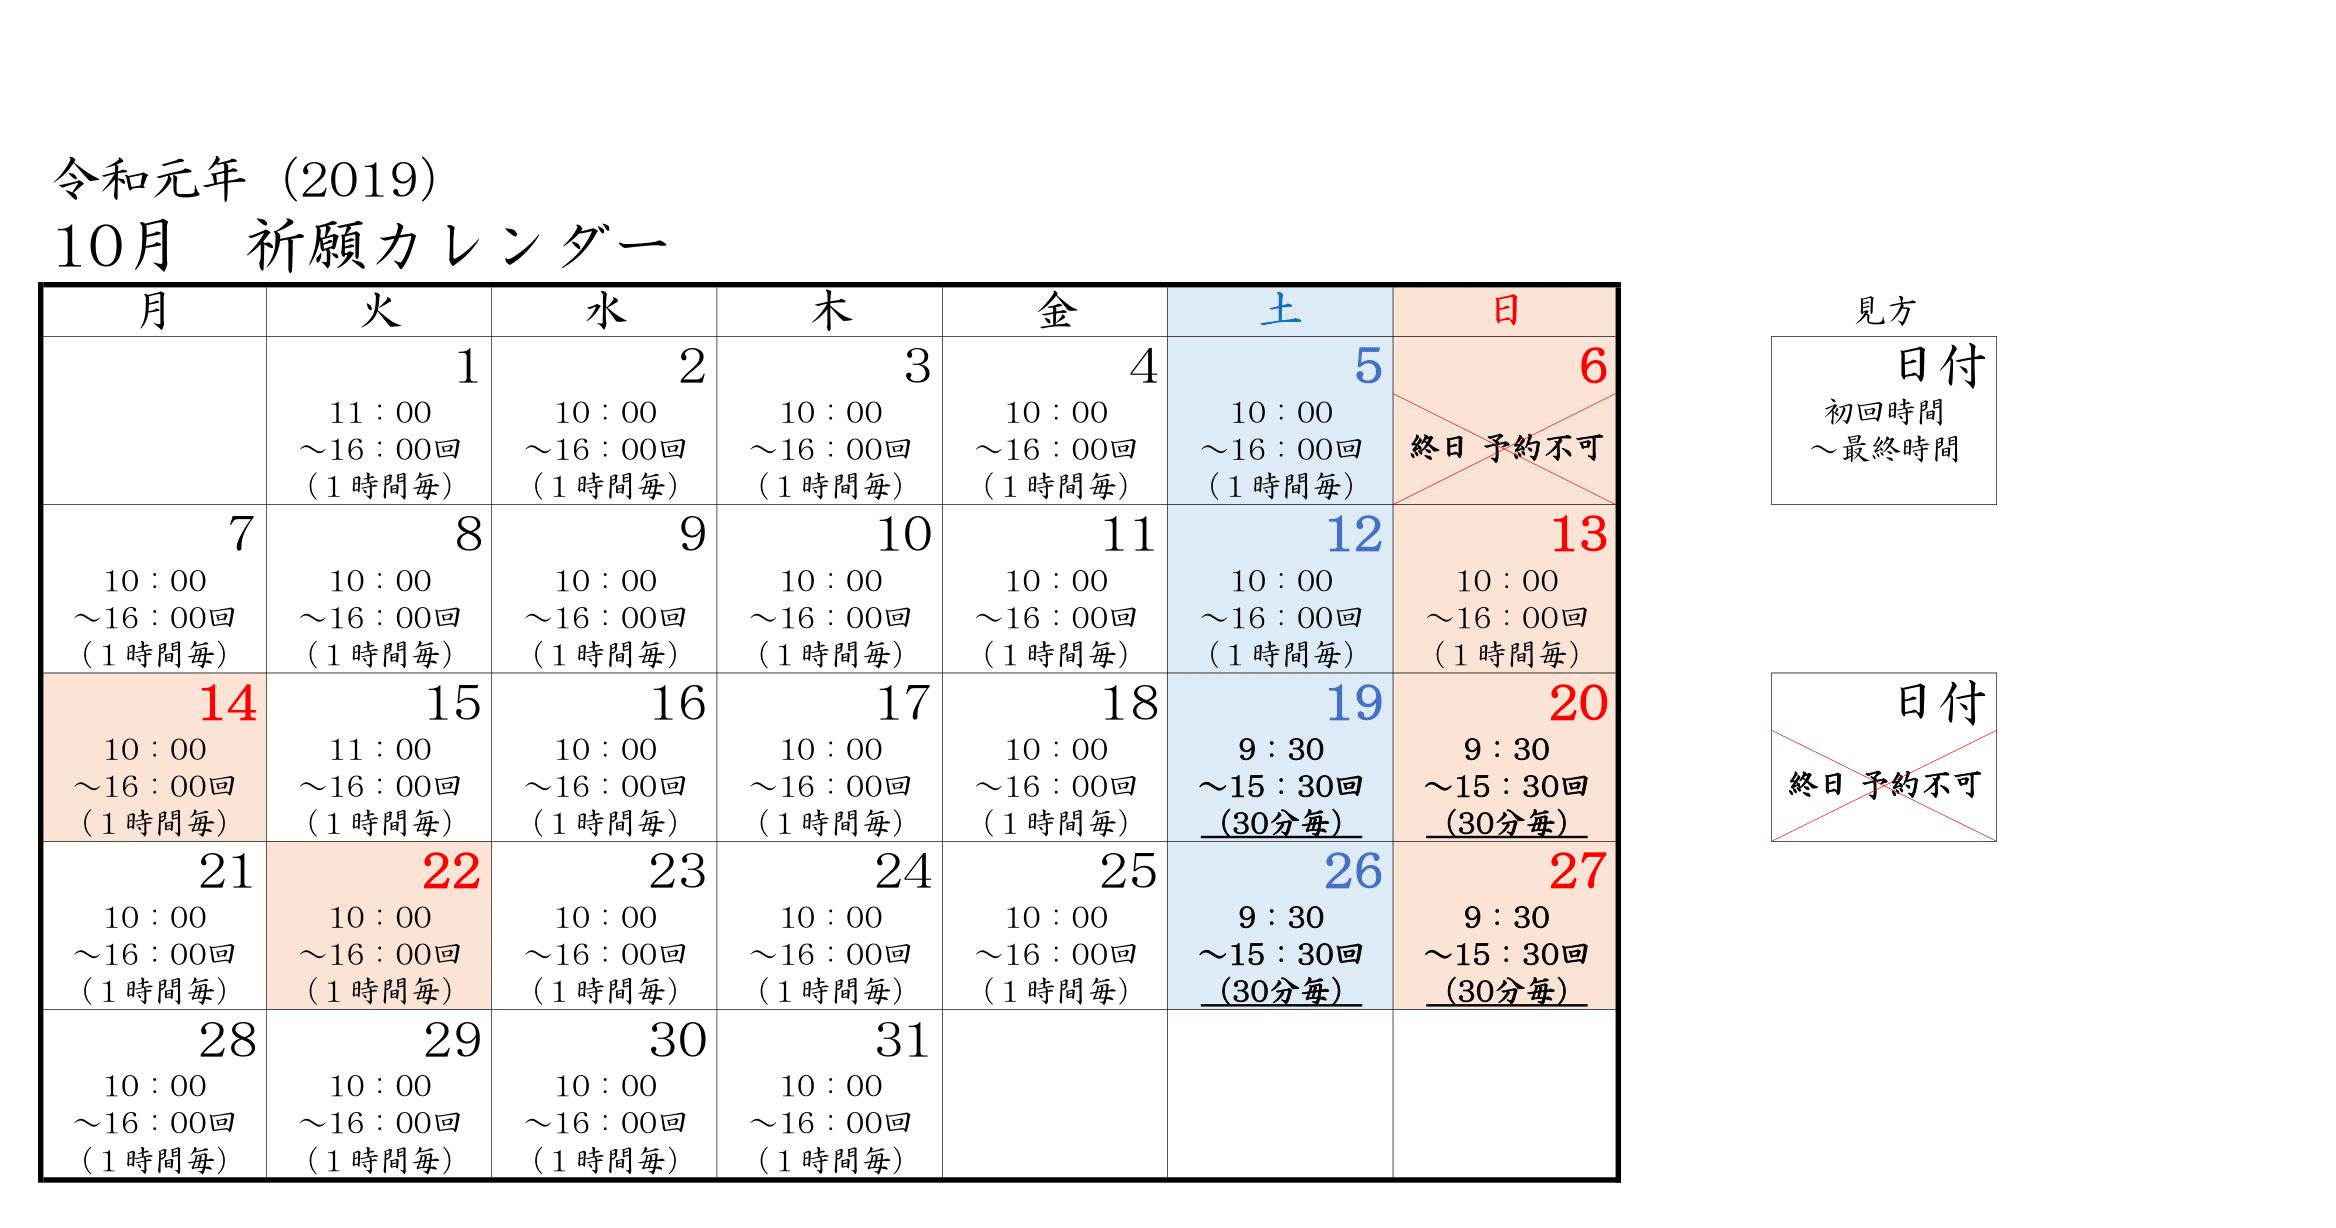 R1.10 七五三 予約カレンダー-1.png